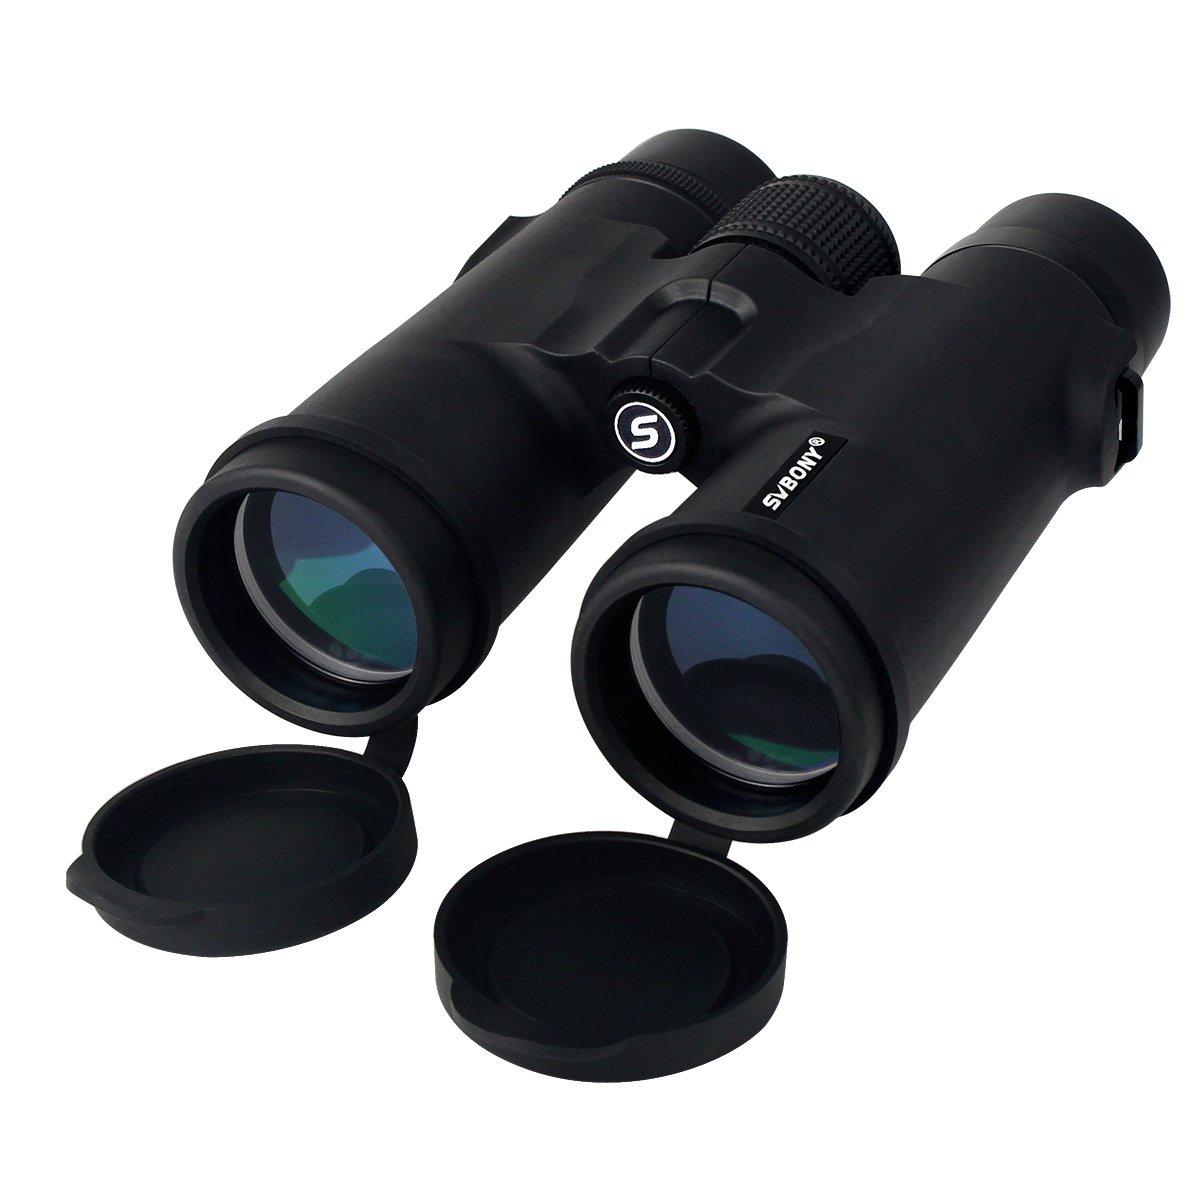 SVBONY SV21 Binocular 10x42 Binoculars for Hunting Camping Hiking Concerts Bird Watching Binoculars